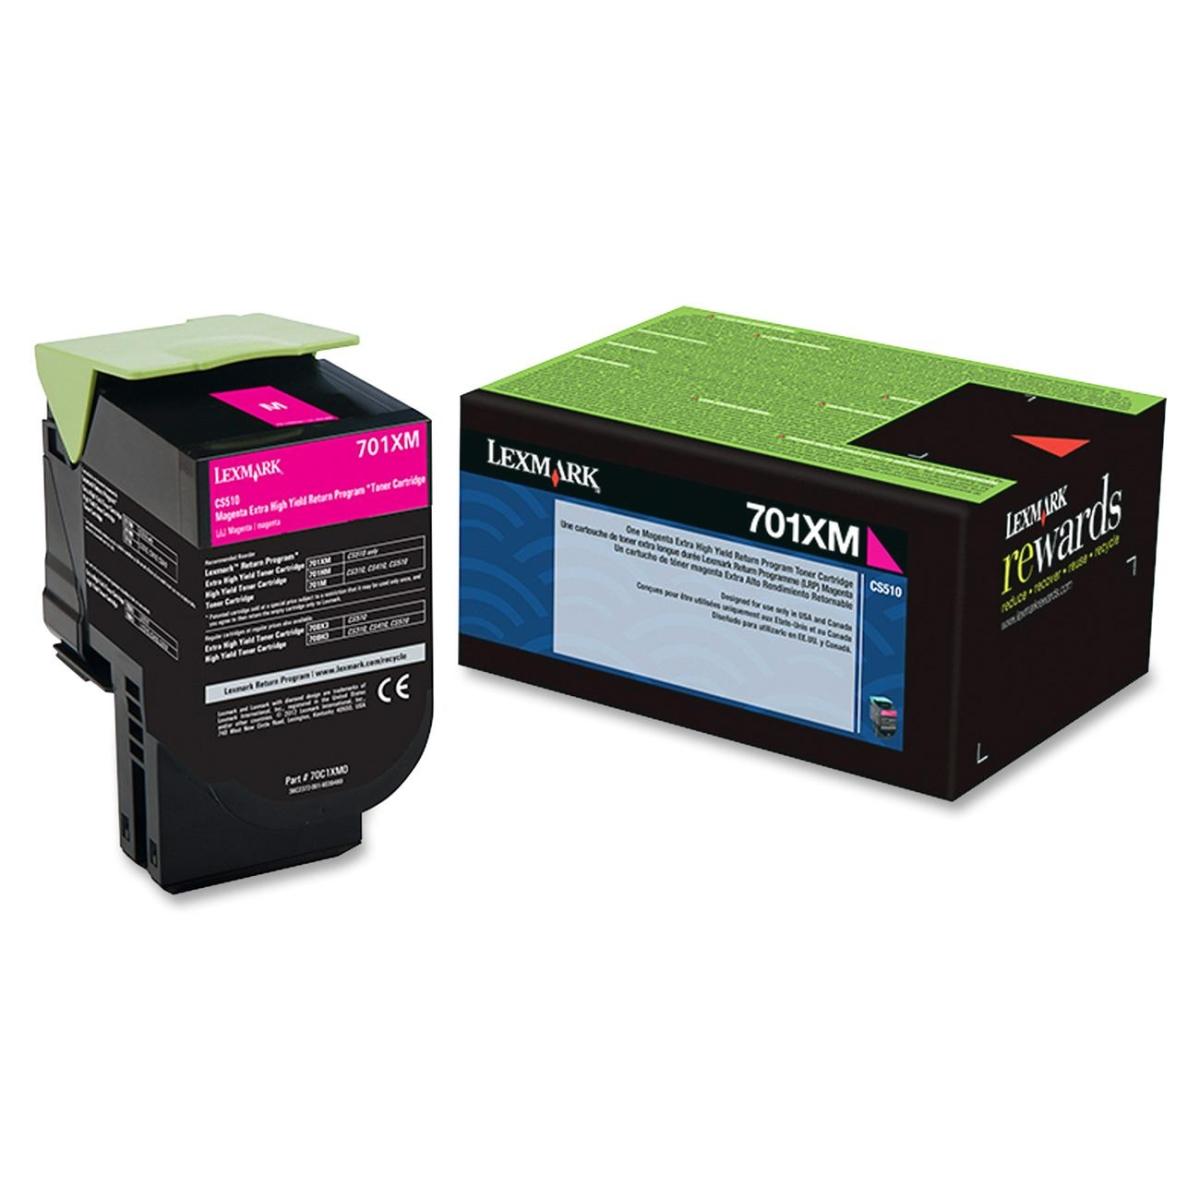 701XM Magenta Extra High Yield Return Program Toner Cartridge - Magenta - Laser - 4000 Page - 1 Each - OEM